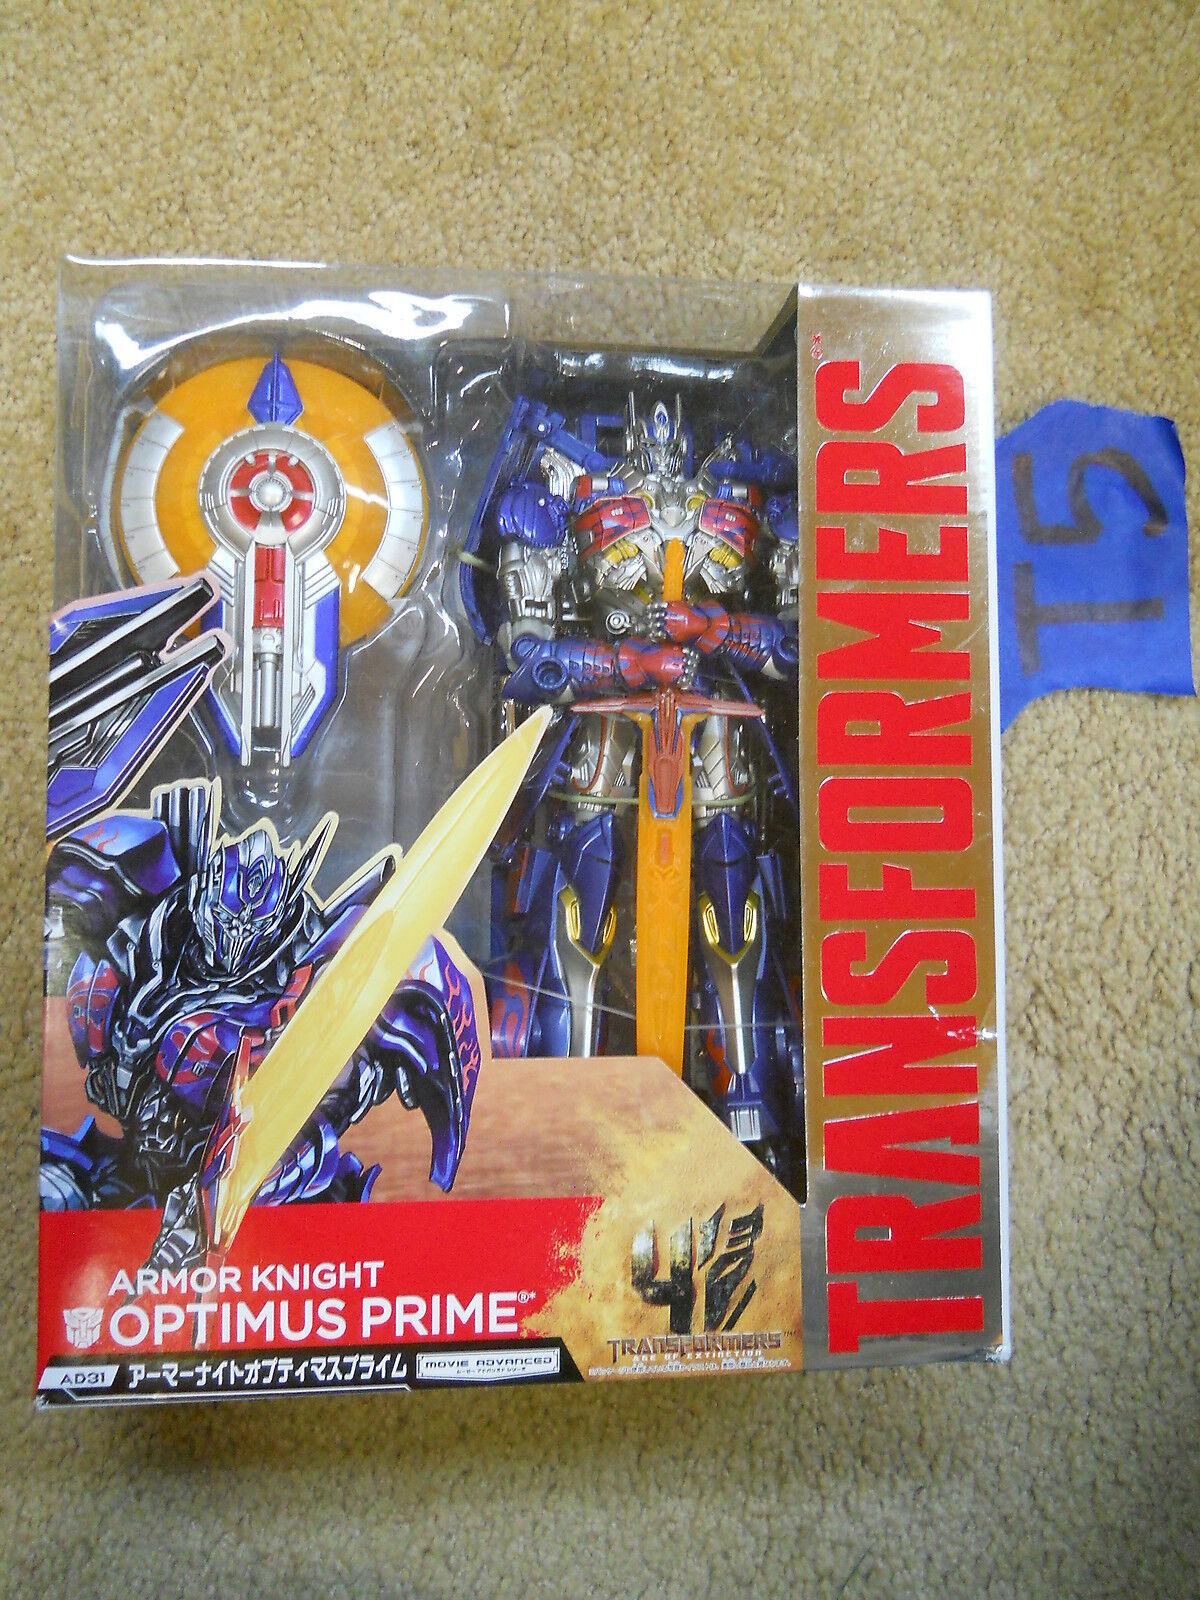 Lote De Transformers T5_9 Takara Armadura Caballero Optimus Prime  2 AD31 ad 31 TF4 g1 AOE